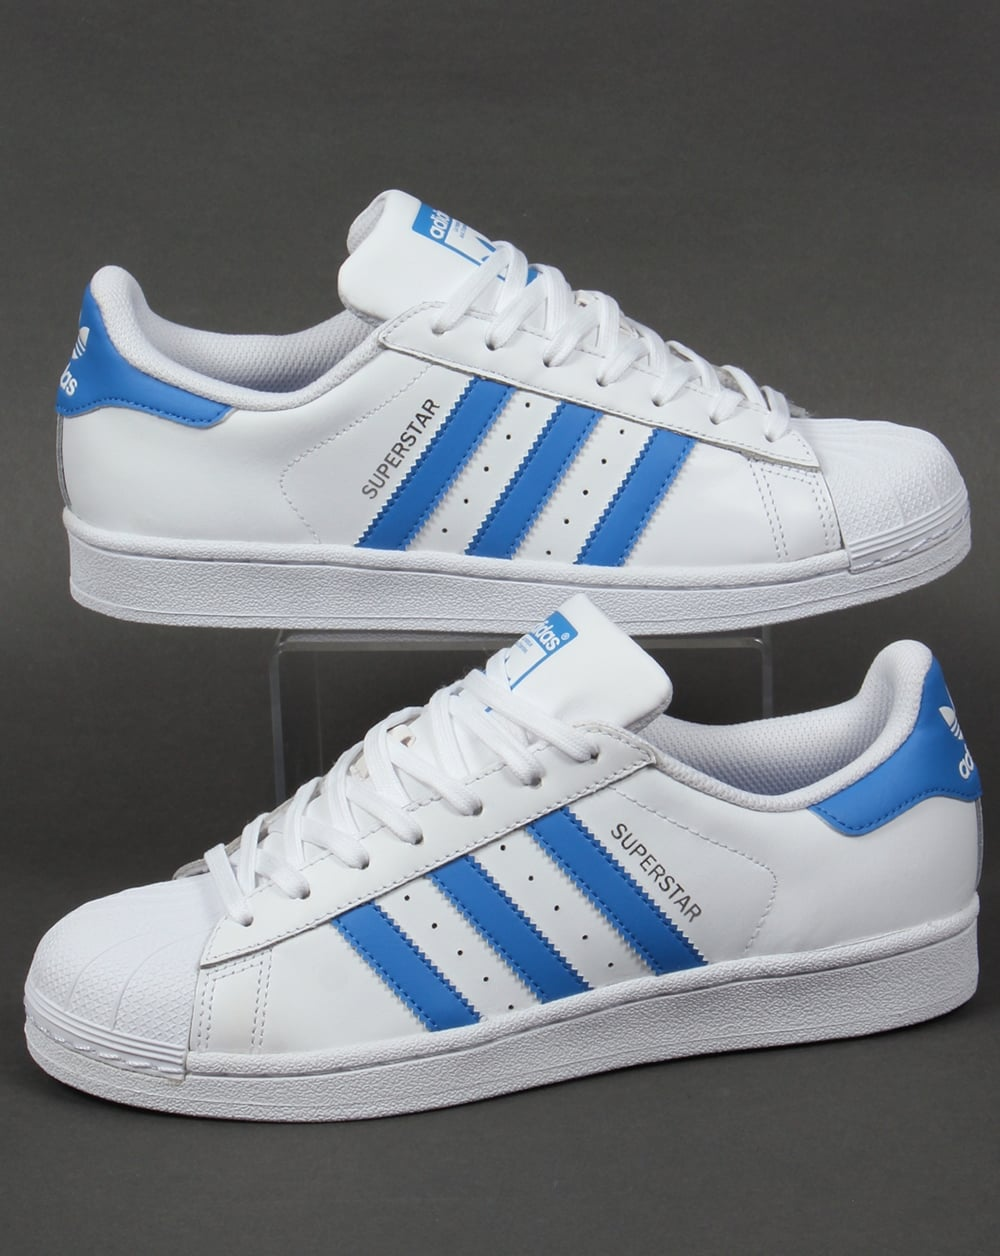 royal blue adidas superstars